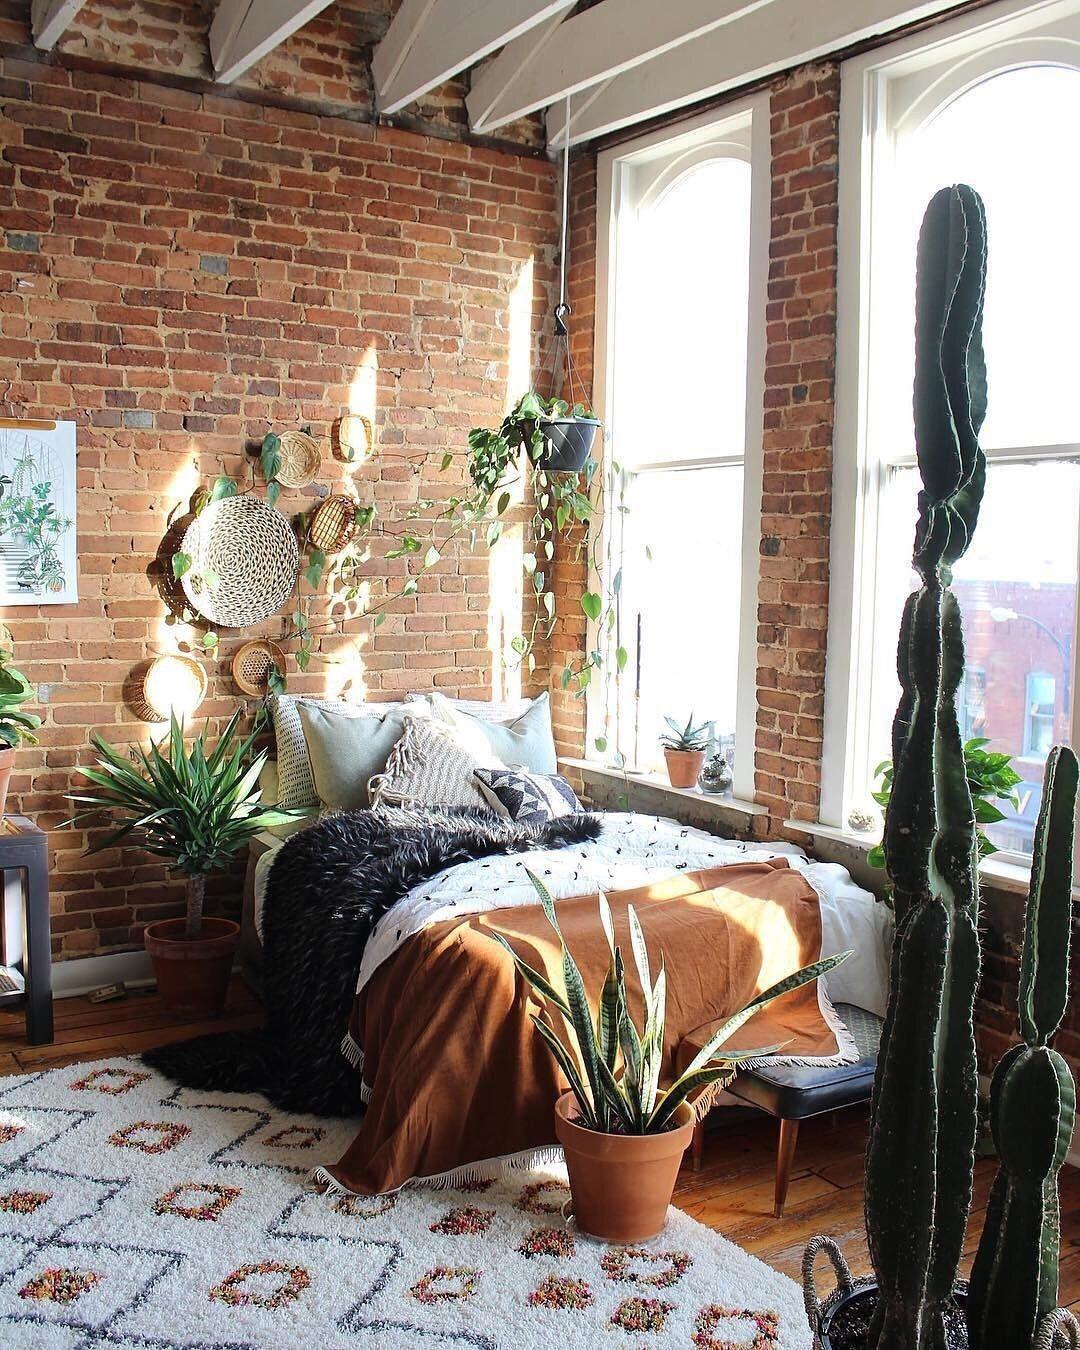 Miri Reinhold Miri3457 On Pinterest #signature #design #by #ashley #fallston #living #room #sectional